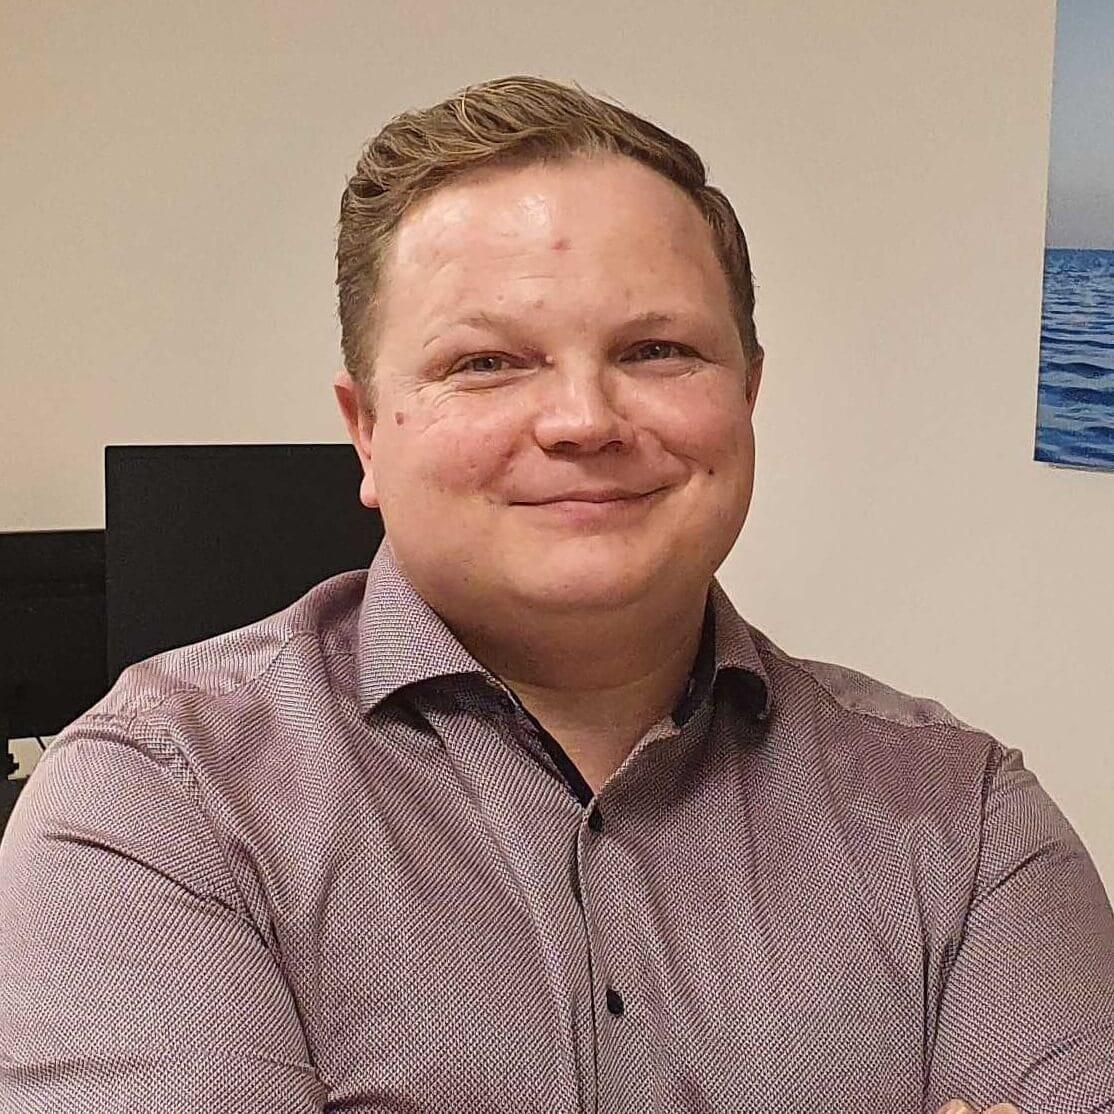 Daniel Berg, Sales Development Representative at Morningscore